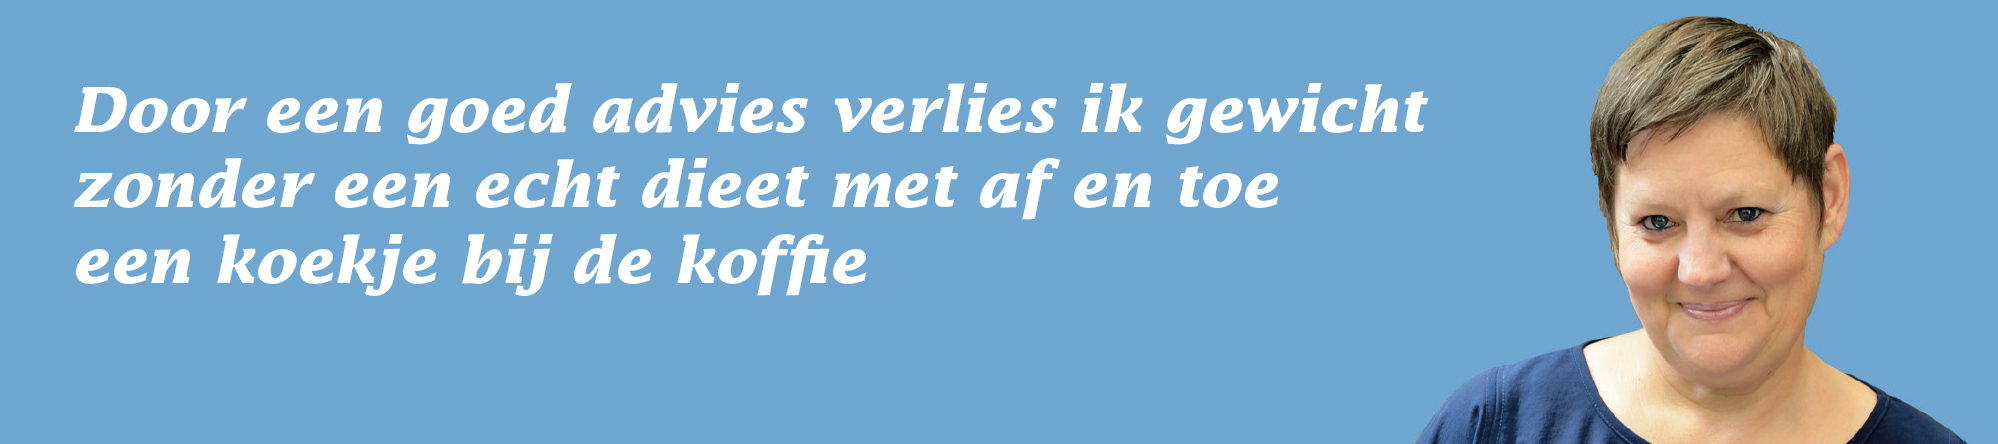 http://de-dietist.nl/wp-content/uploads/2016/09/de-dietist-quote-marisa.jpg